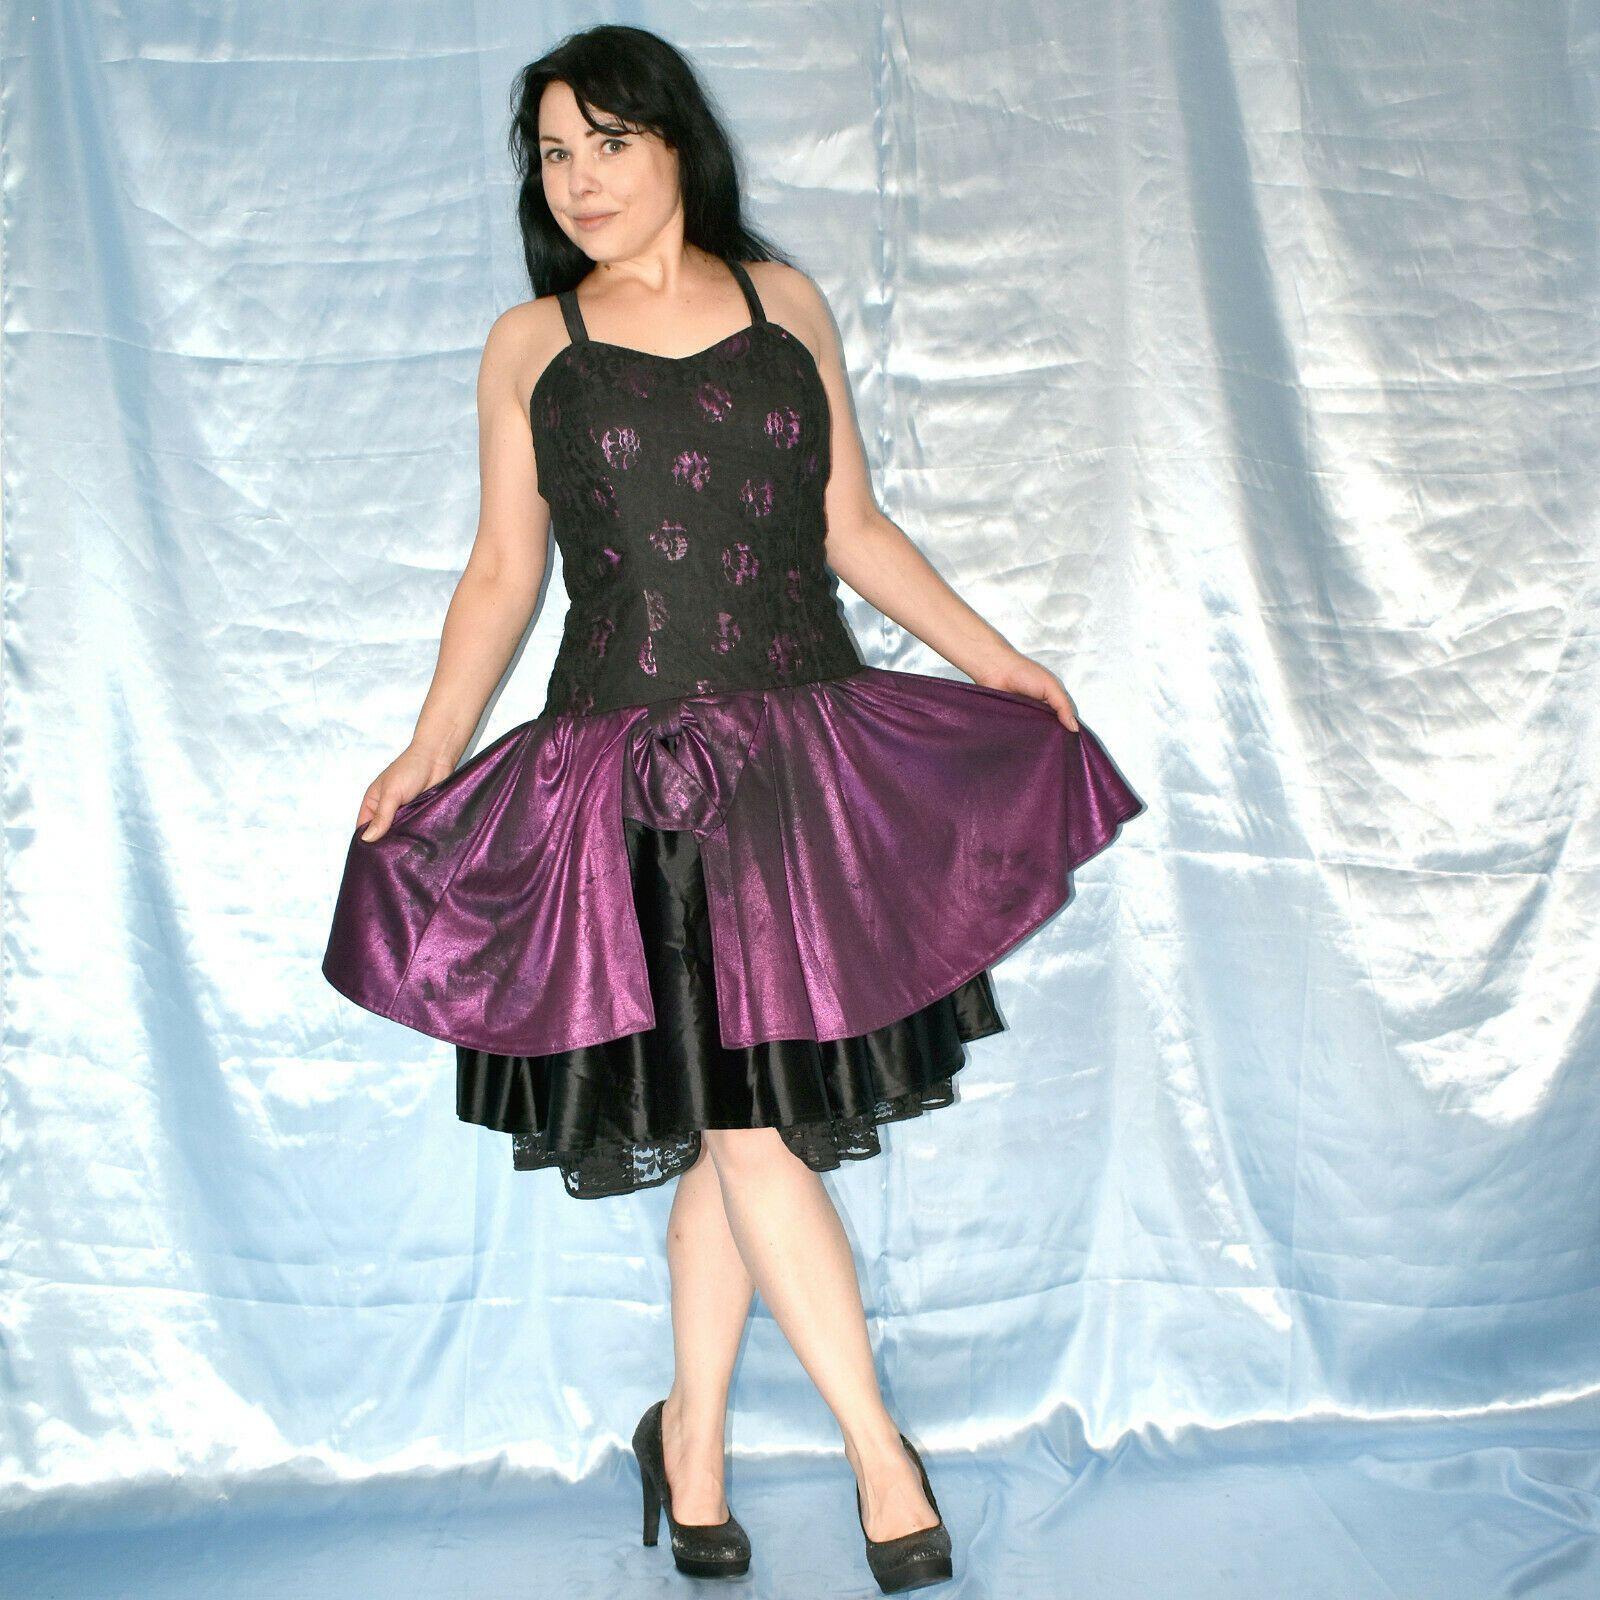 lila-schwarzes spitzen abendkleid s 38 sommerkleid etuikleid